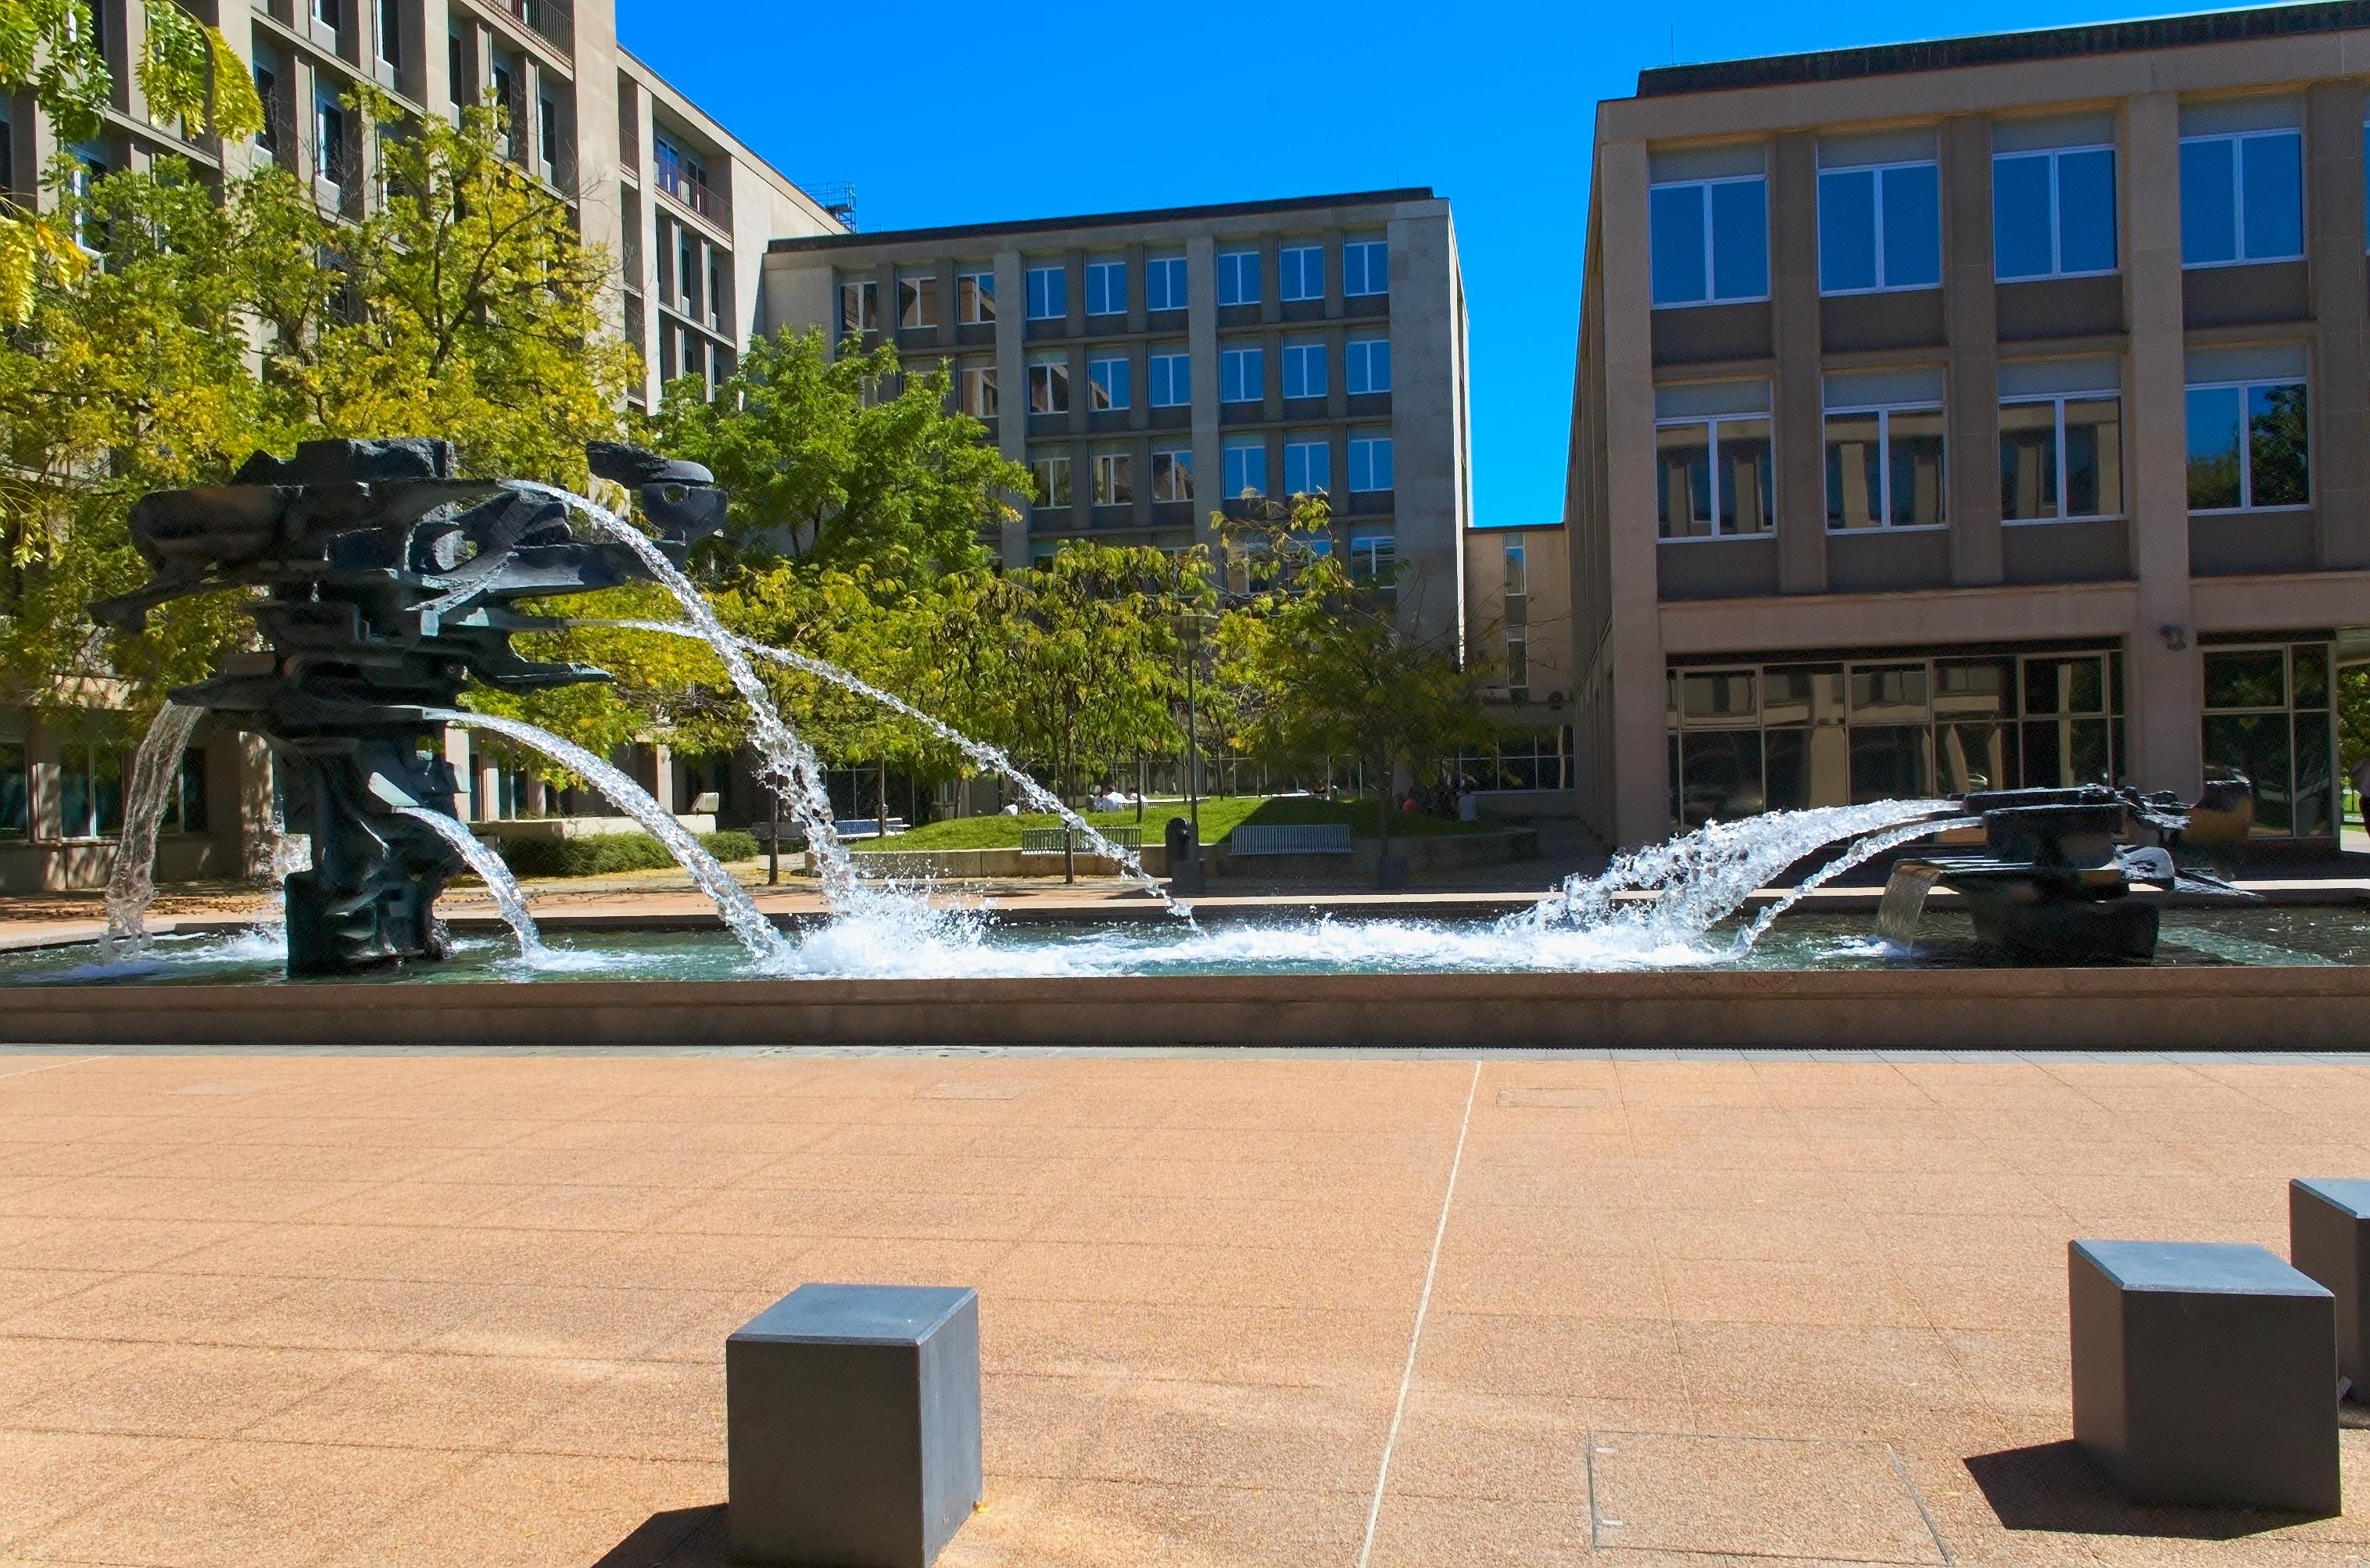 File:Norma Redapth Treasury Building Fountain side view.jpg